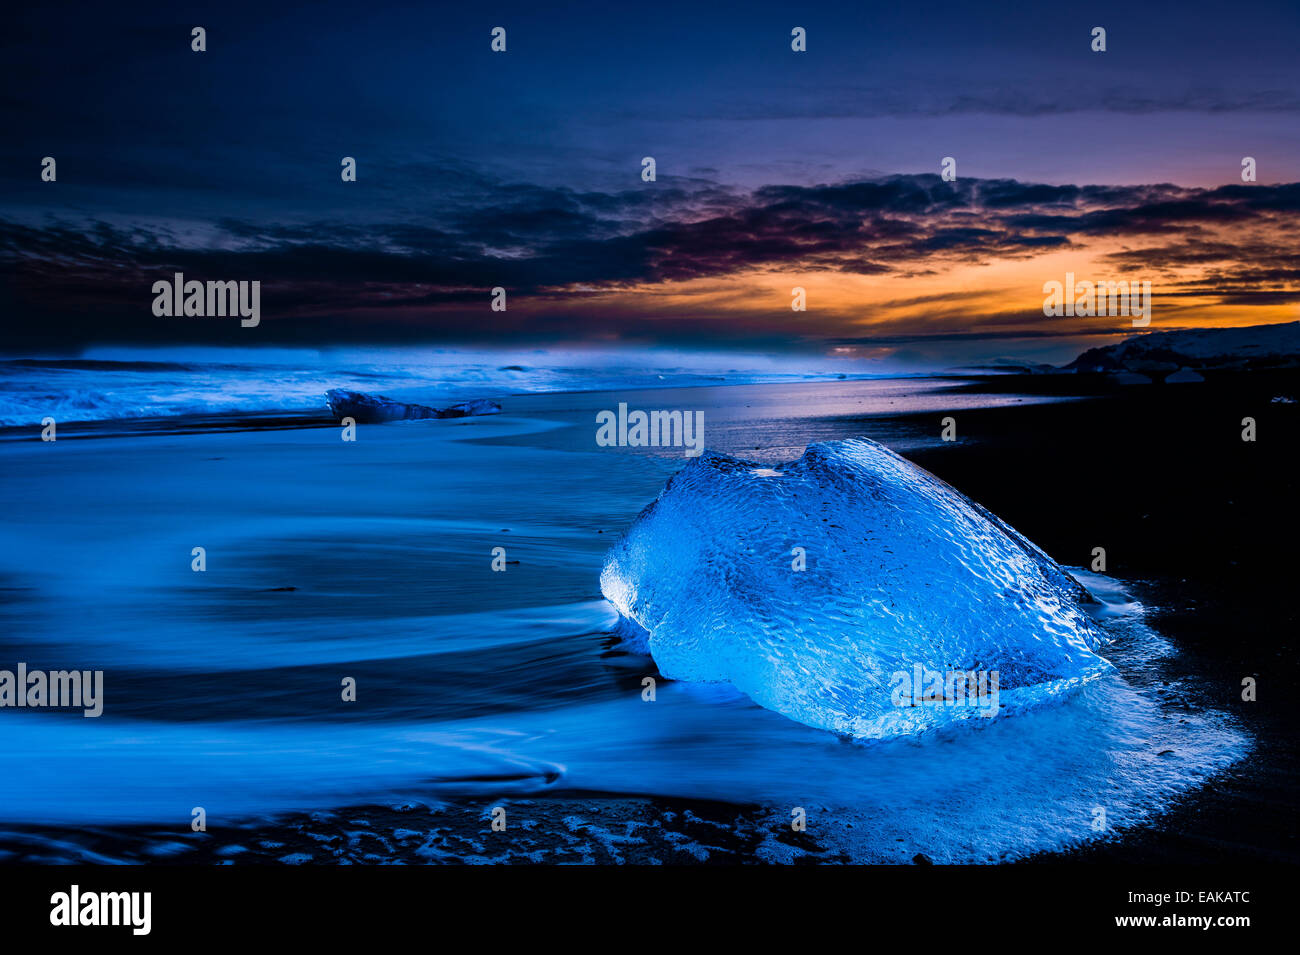 Chunk of ice on black lava sand beach at the blue hour, Jökulsárlón lake, Vik, Iceland - Stock Image